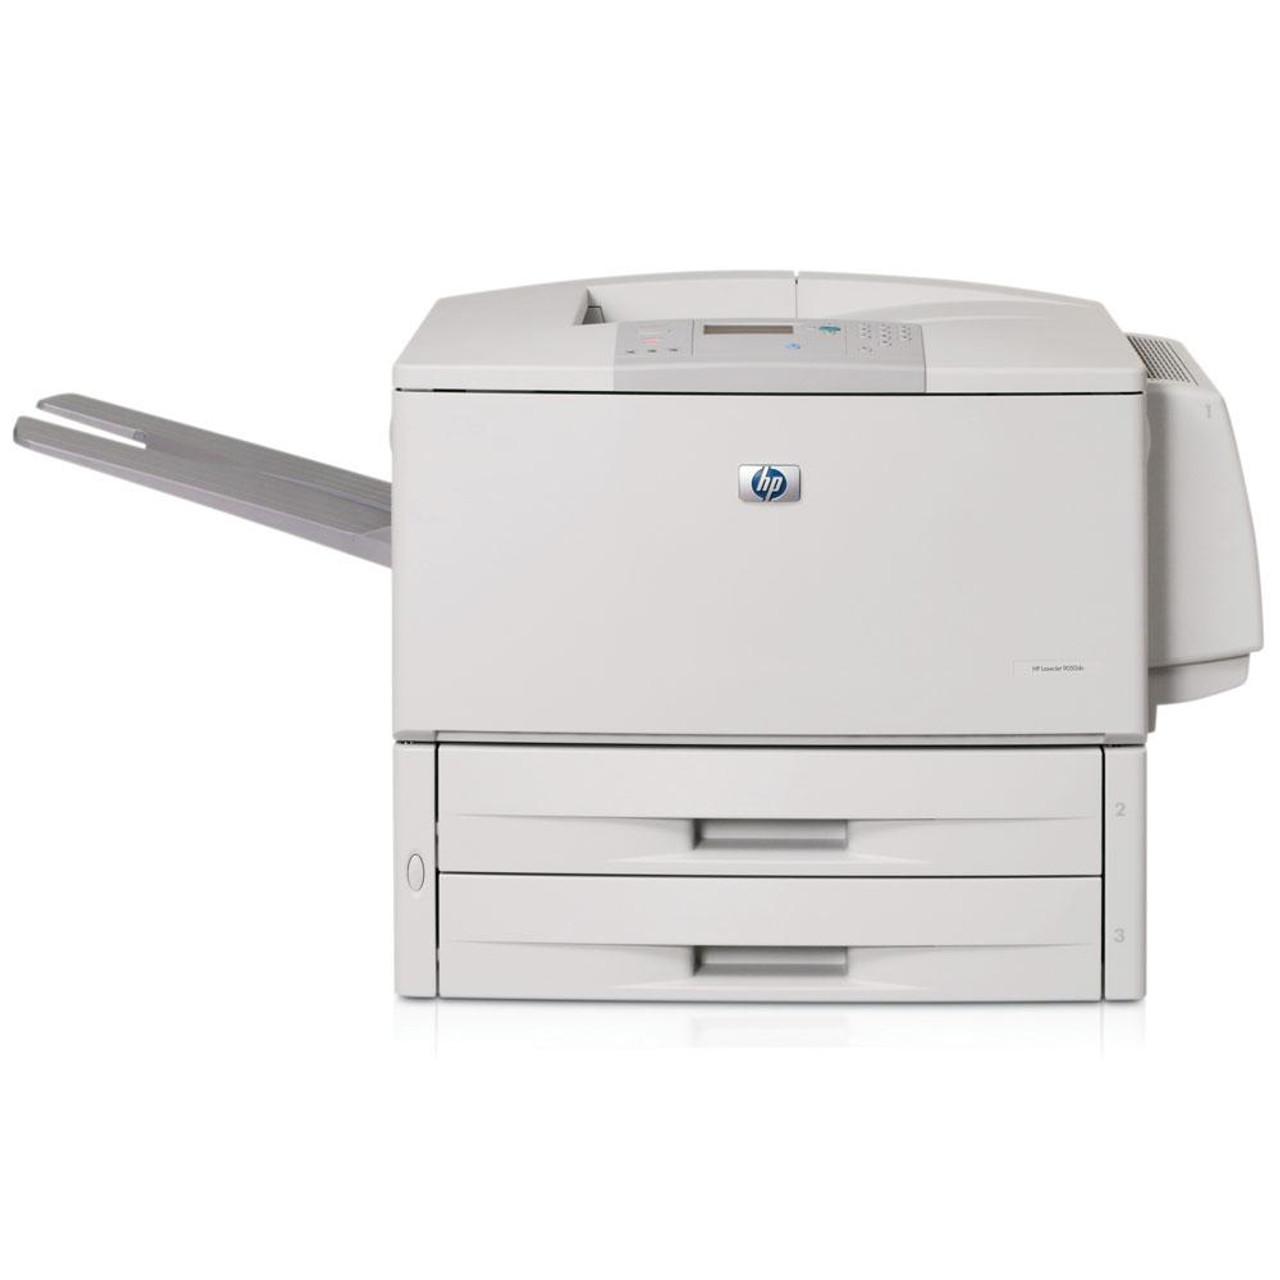 HP LaserJet 9000 - C8519A - HP 11x17 Laser Printer for sale